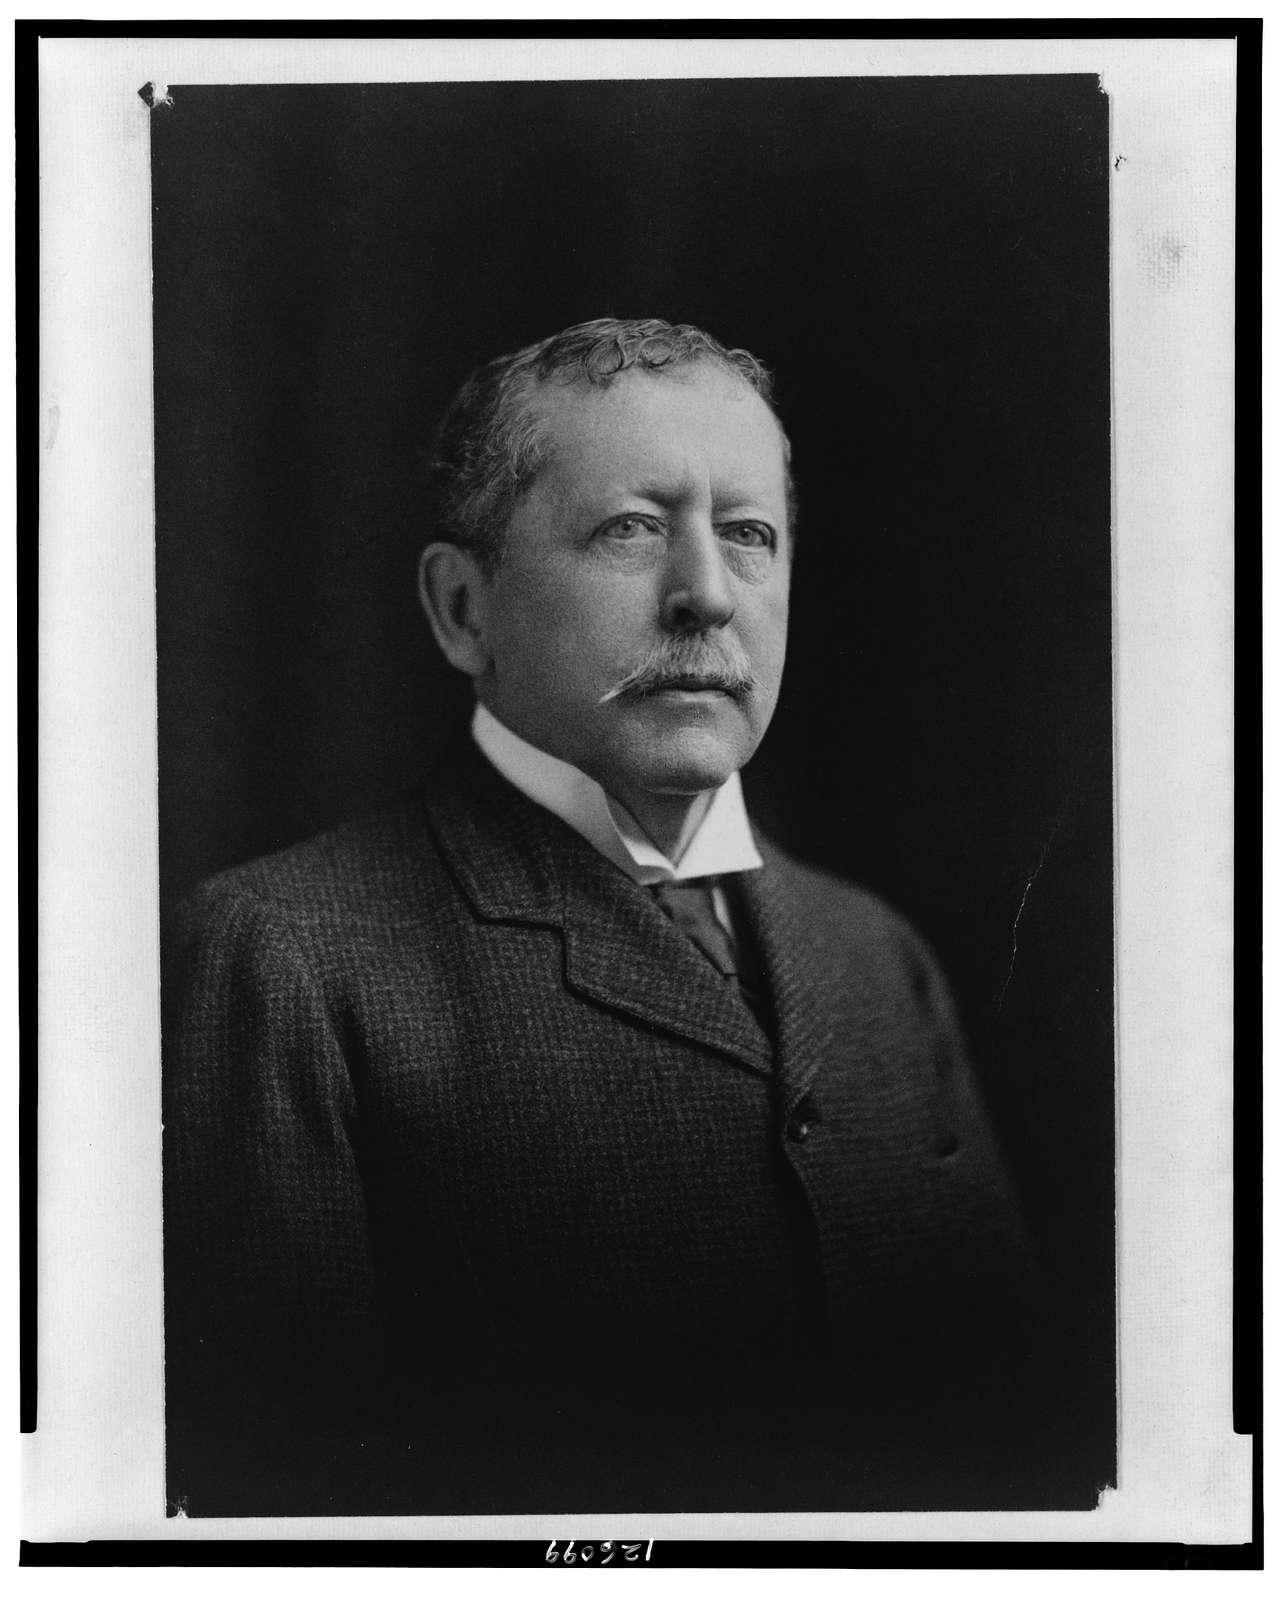 [Thomas Bailey Aldrich, head-and-shoulders portrait, facing front] / Maria Maude Robinson (?).